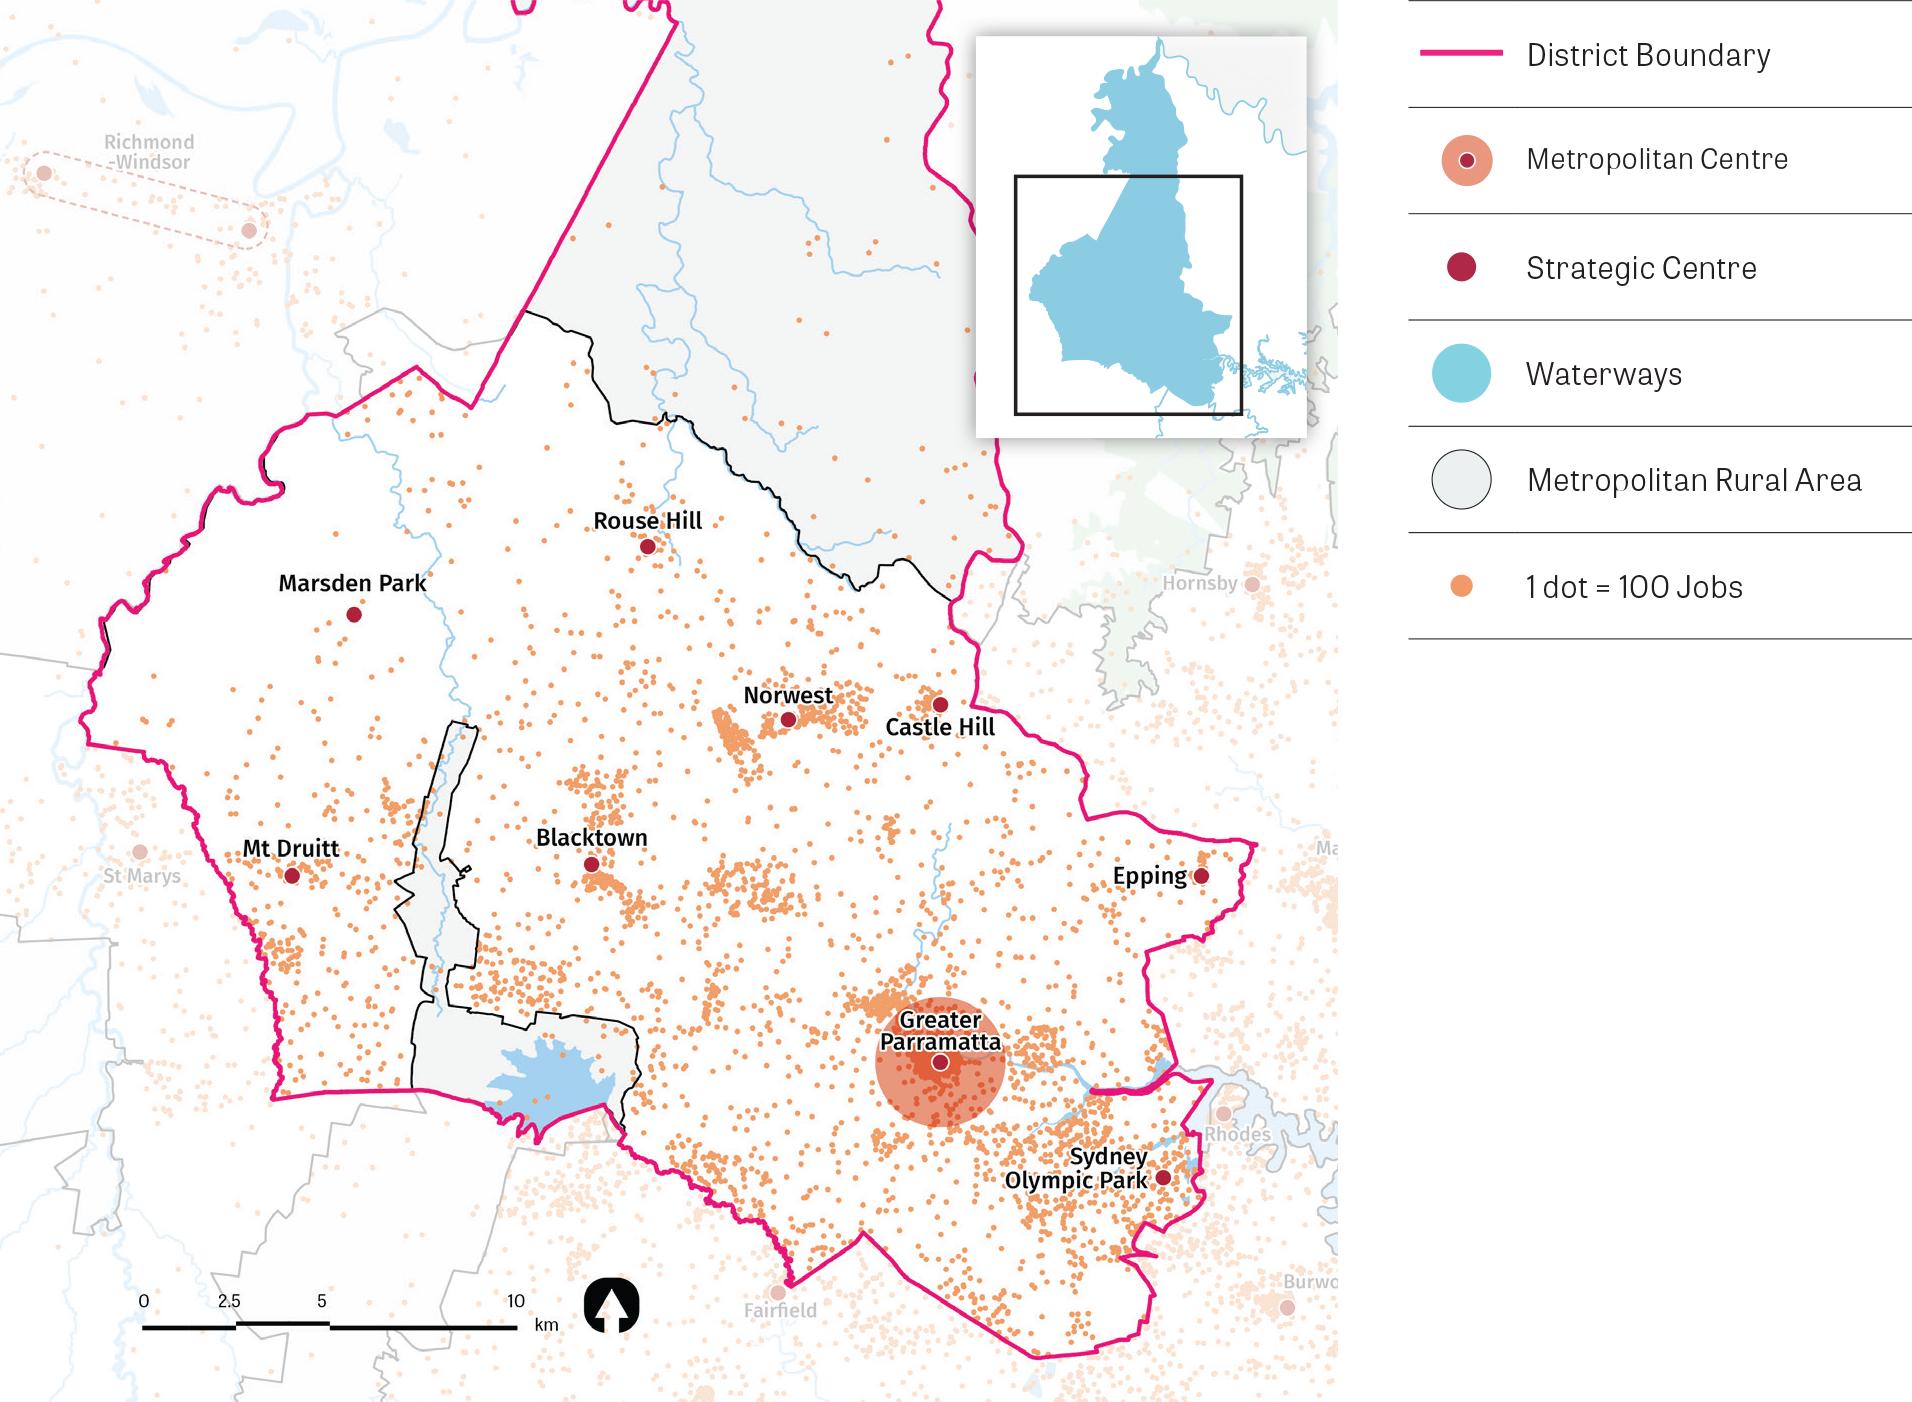 Figure 15: Central City District job density. A map showing job density within the District. The highest job concentrations are near Kogarah, Bankstown, Hurstville, Miranda, Sutherland and Campsie.